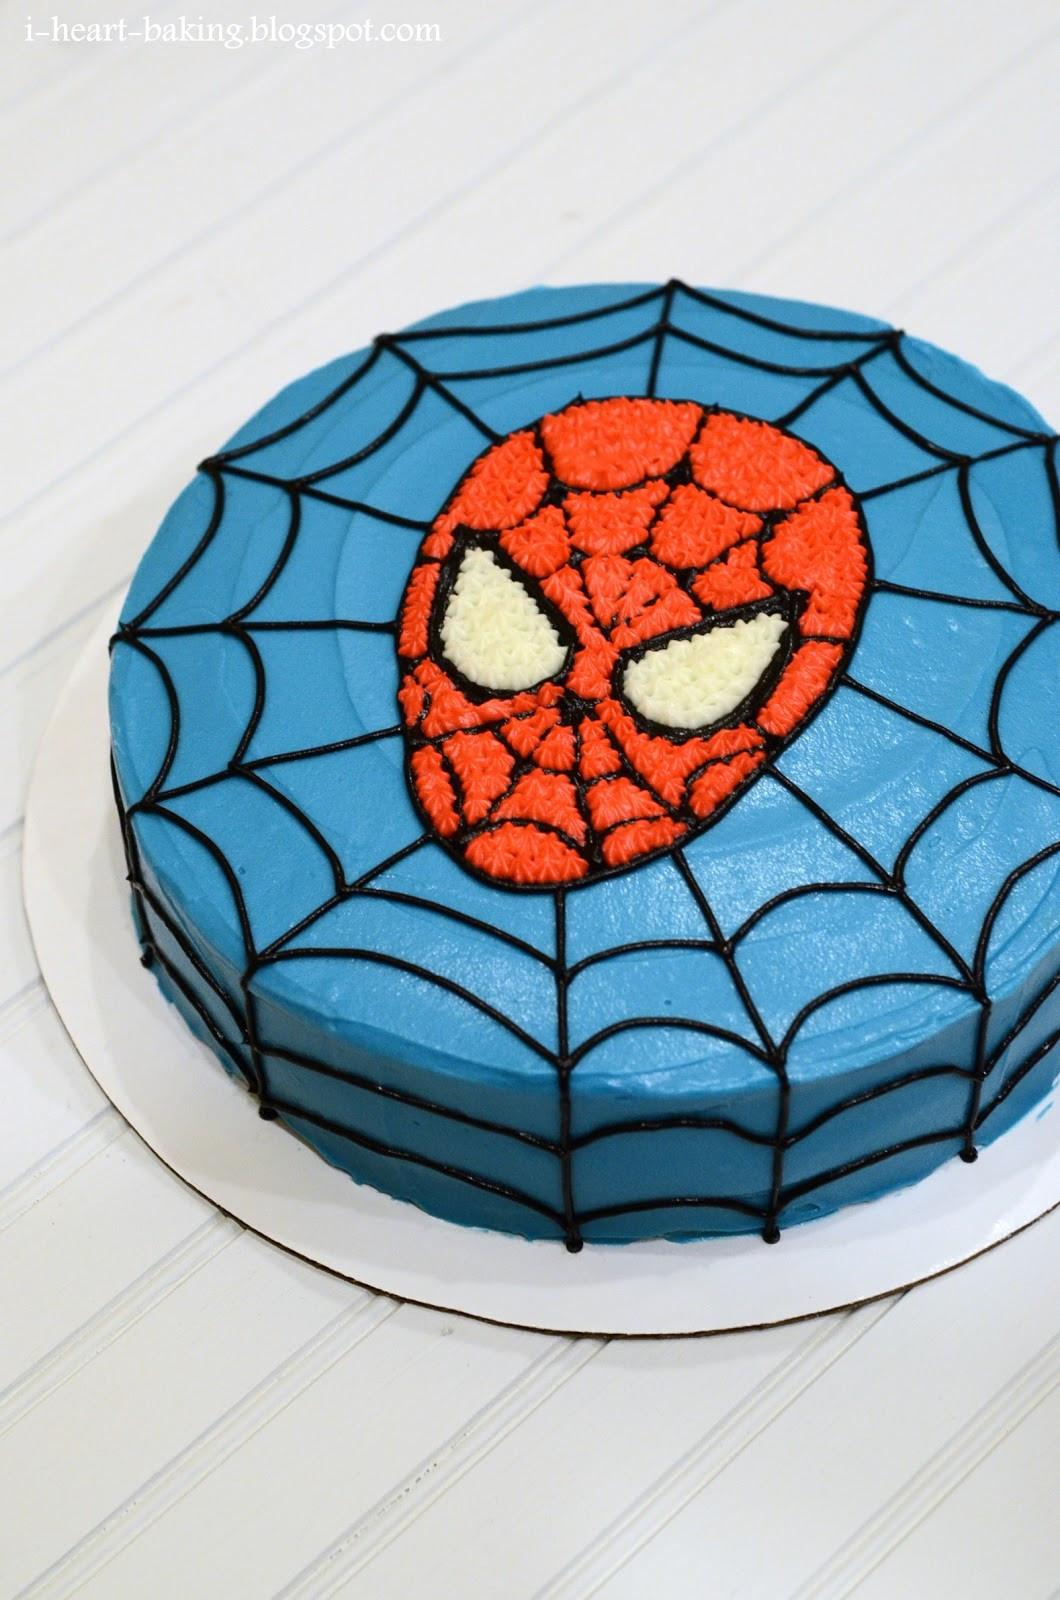 Spiderman Birthday Cakes  i heart baking spiderman birthday cake